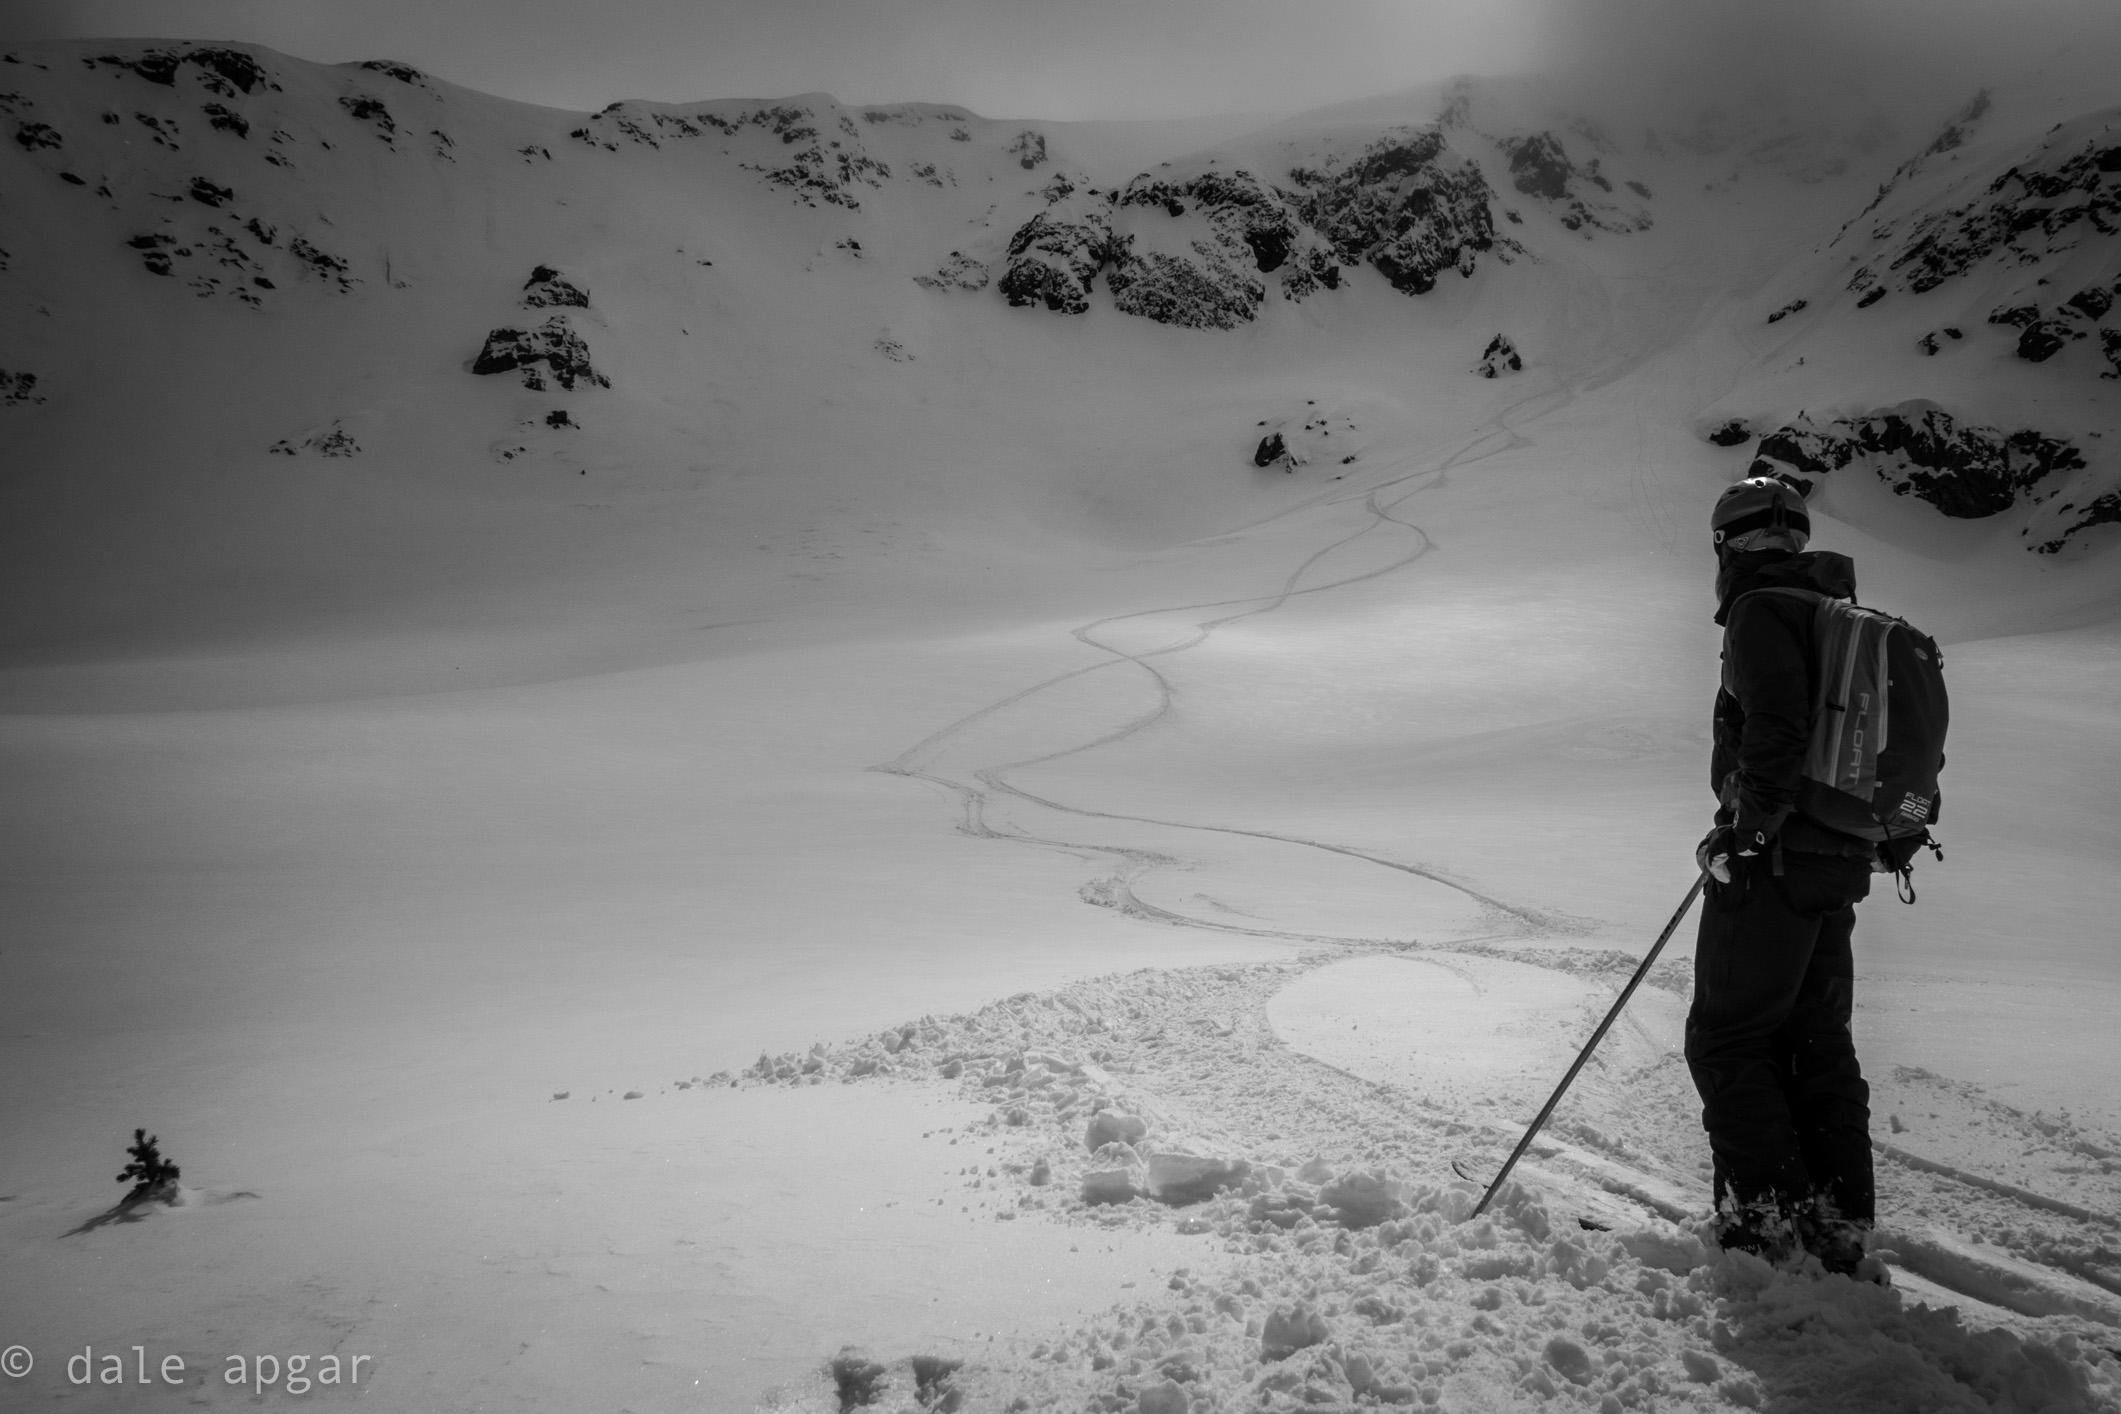 dale_apgar_ski-29.jpg